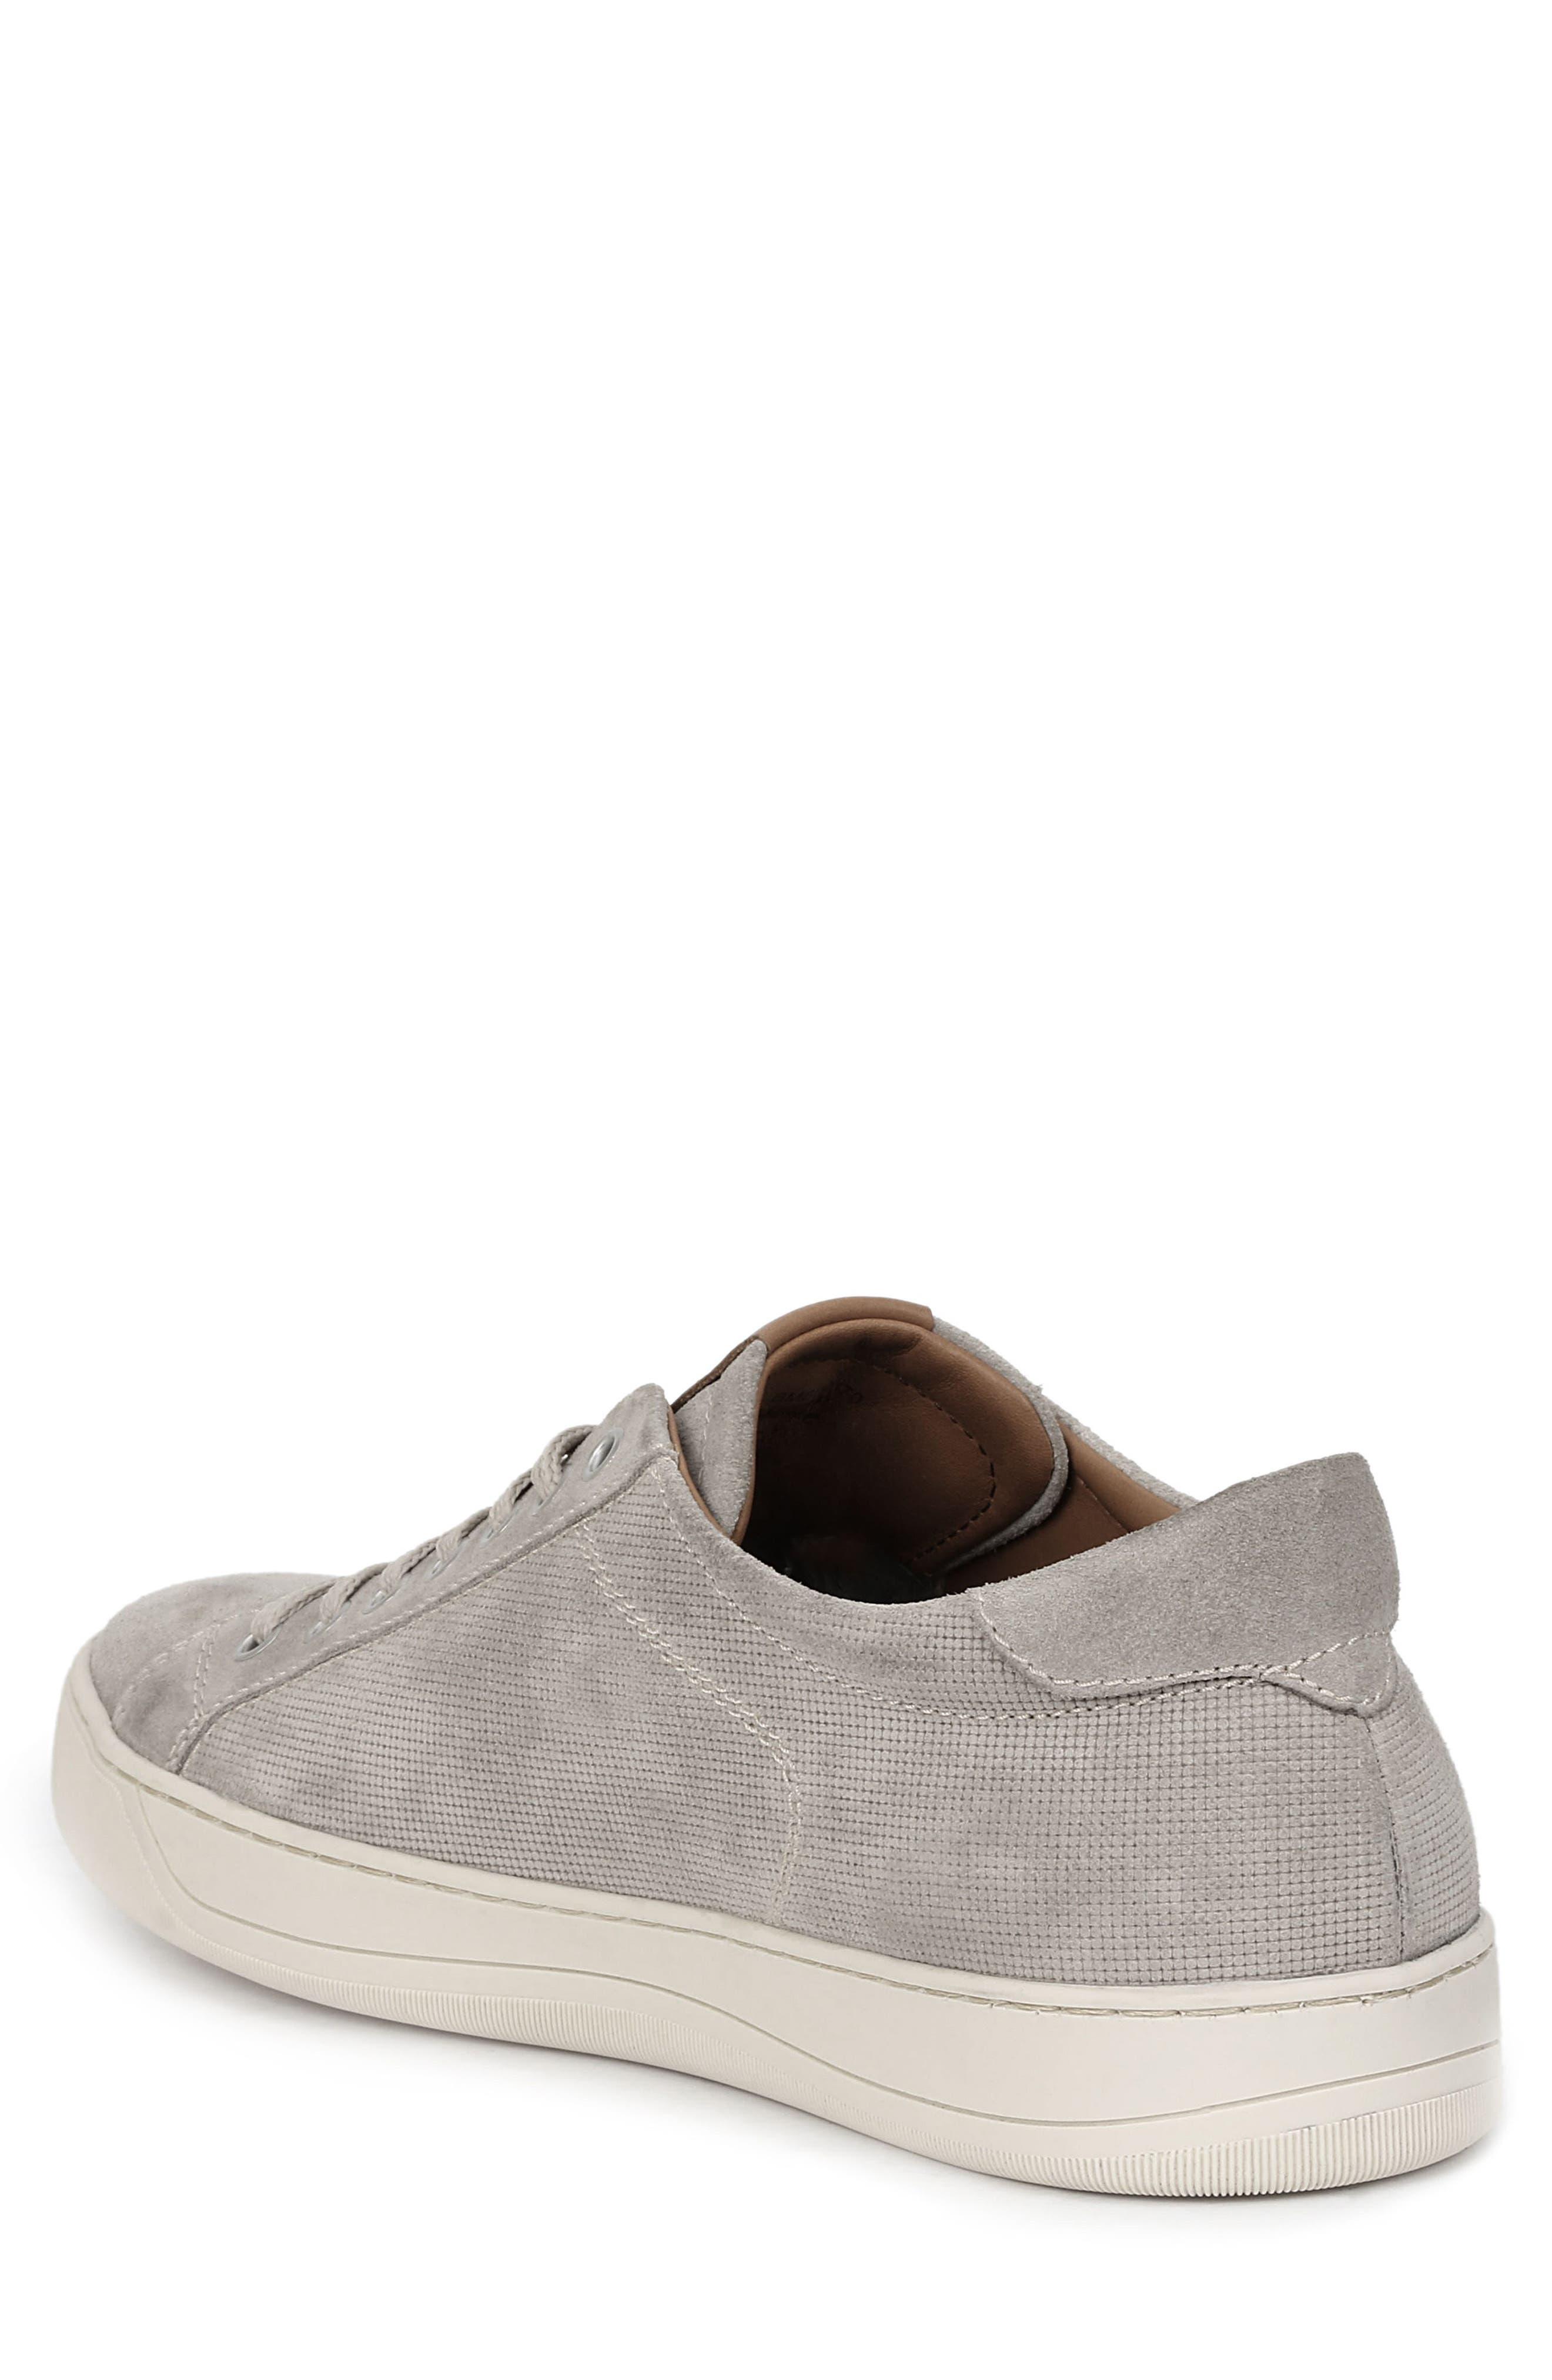 Walter Sneaker,                             Alternate thumbnail 2, color,                             Grey